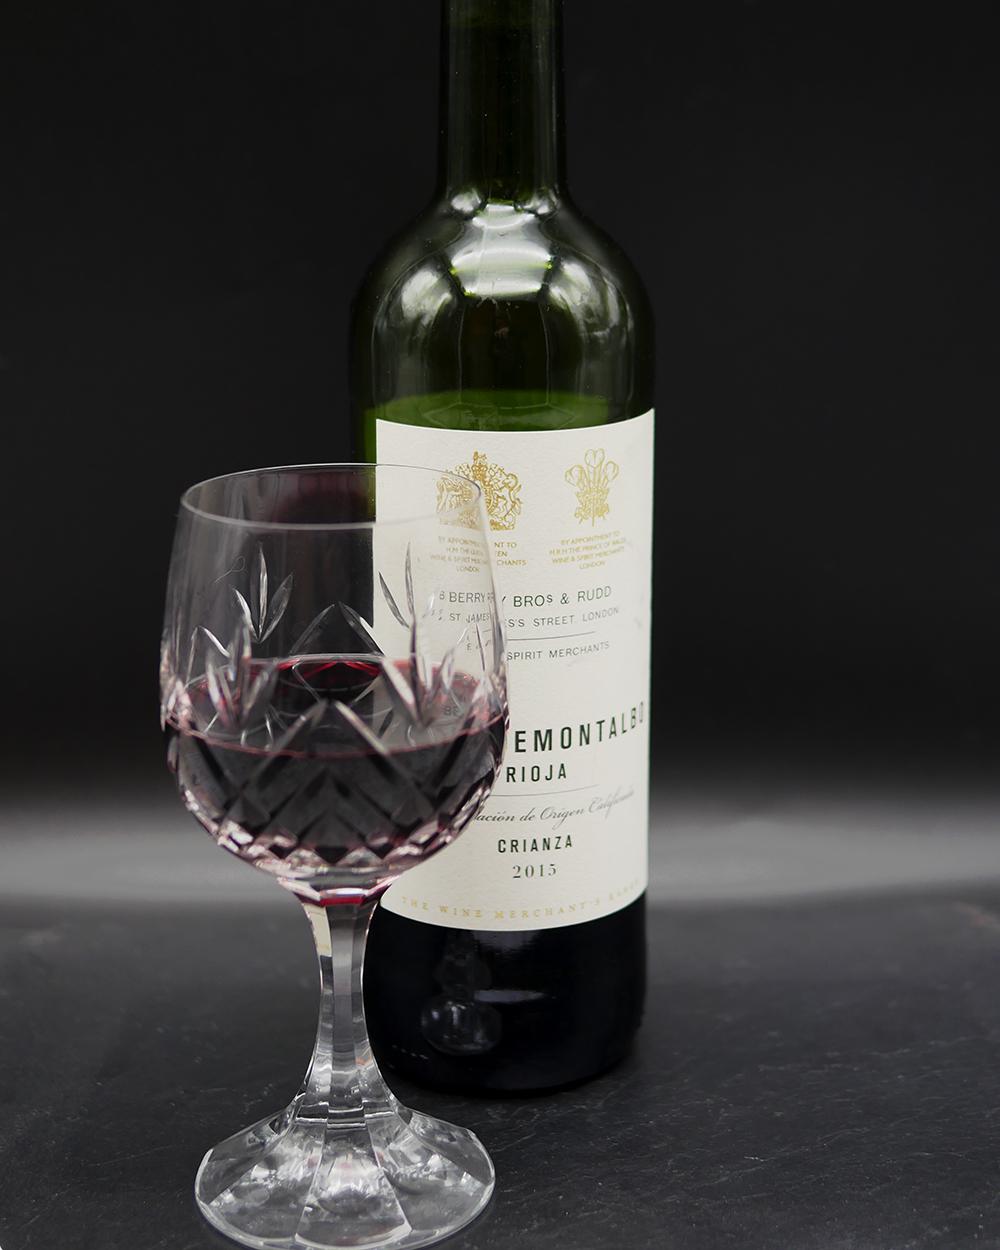 Berry Brothers and Rudd Rioja - christmas wine pairings